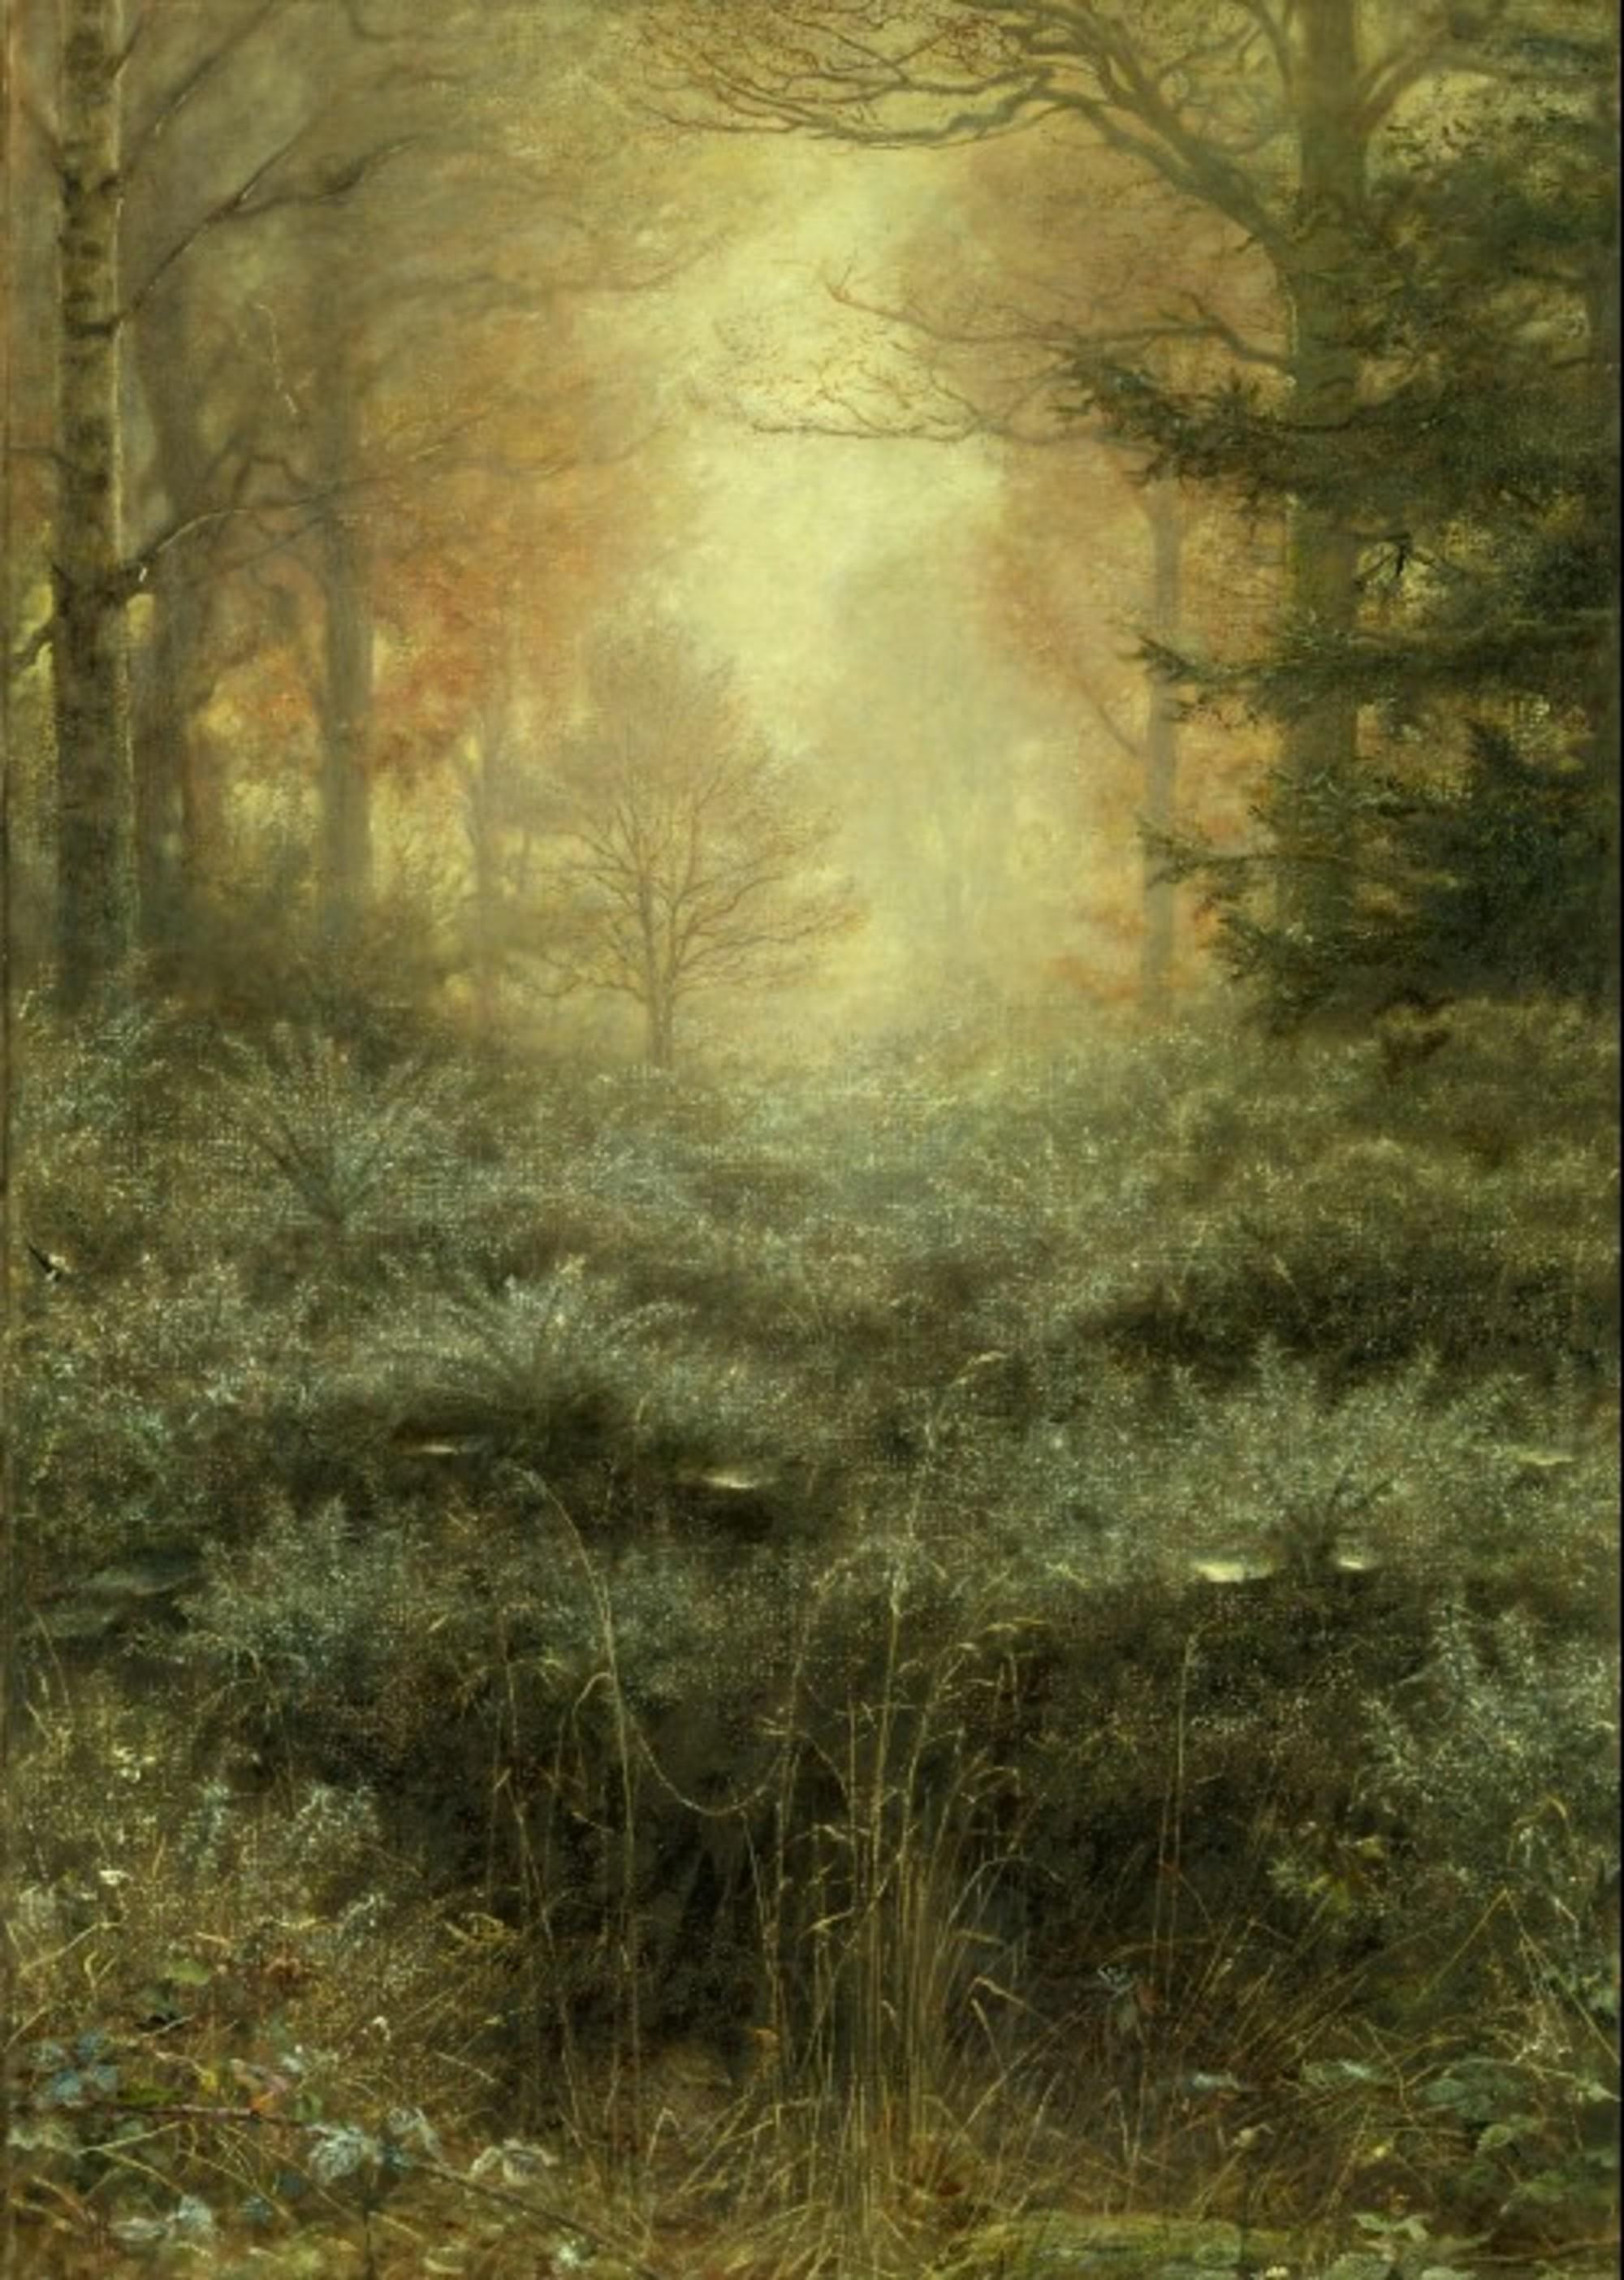 Sir-John-Everett-Millais---Dew-Drenched-Furze-Tate-Britain.jpg